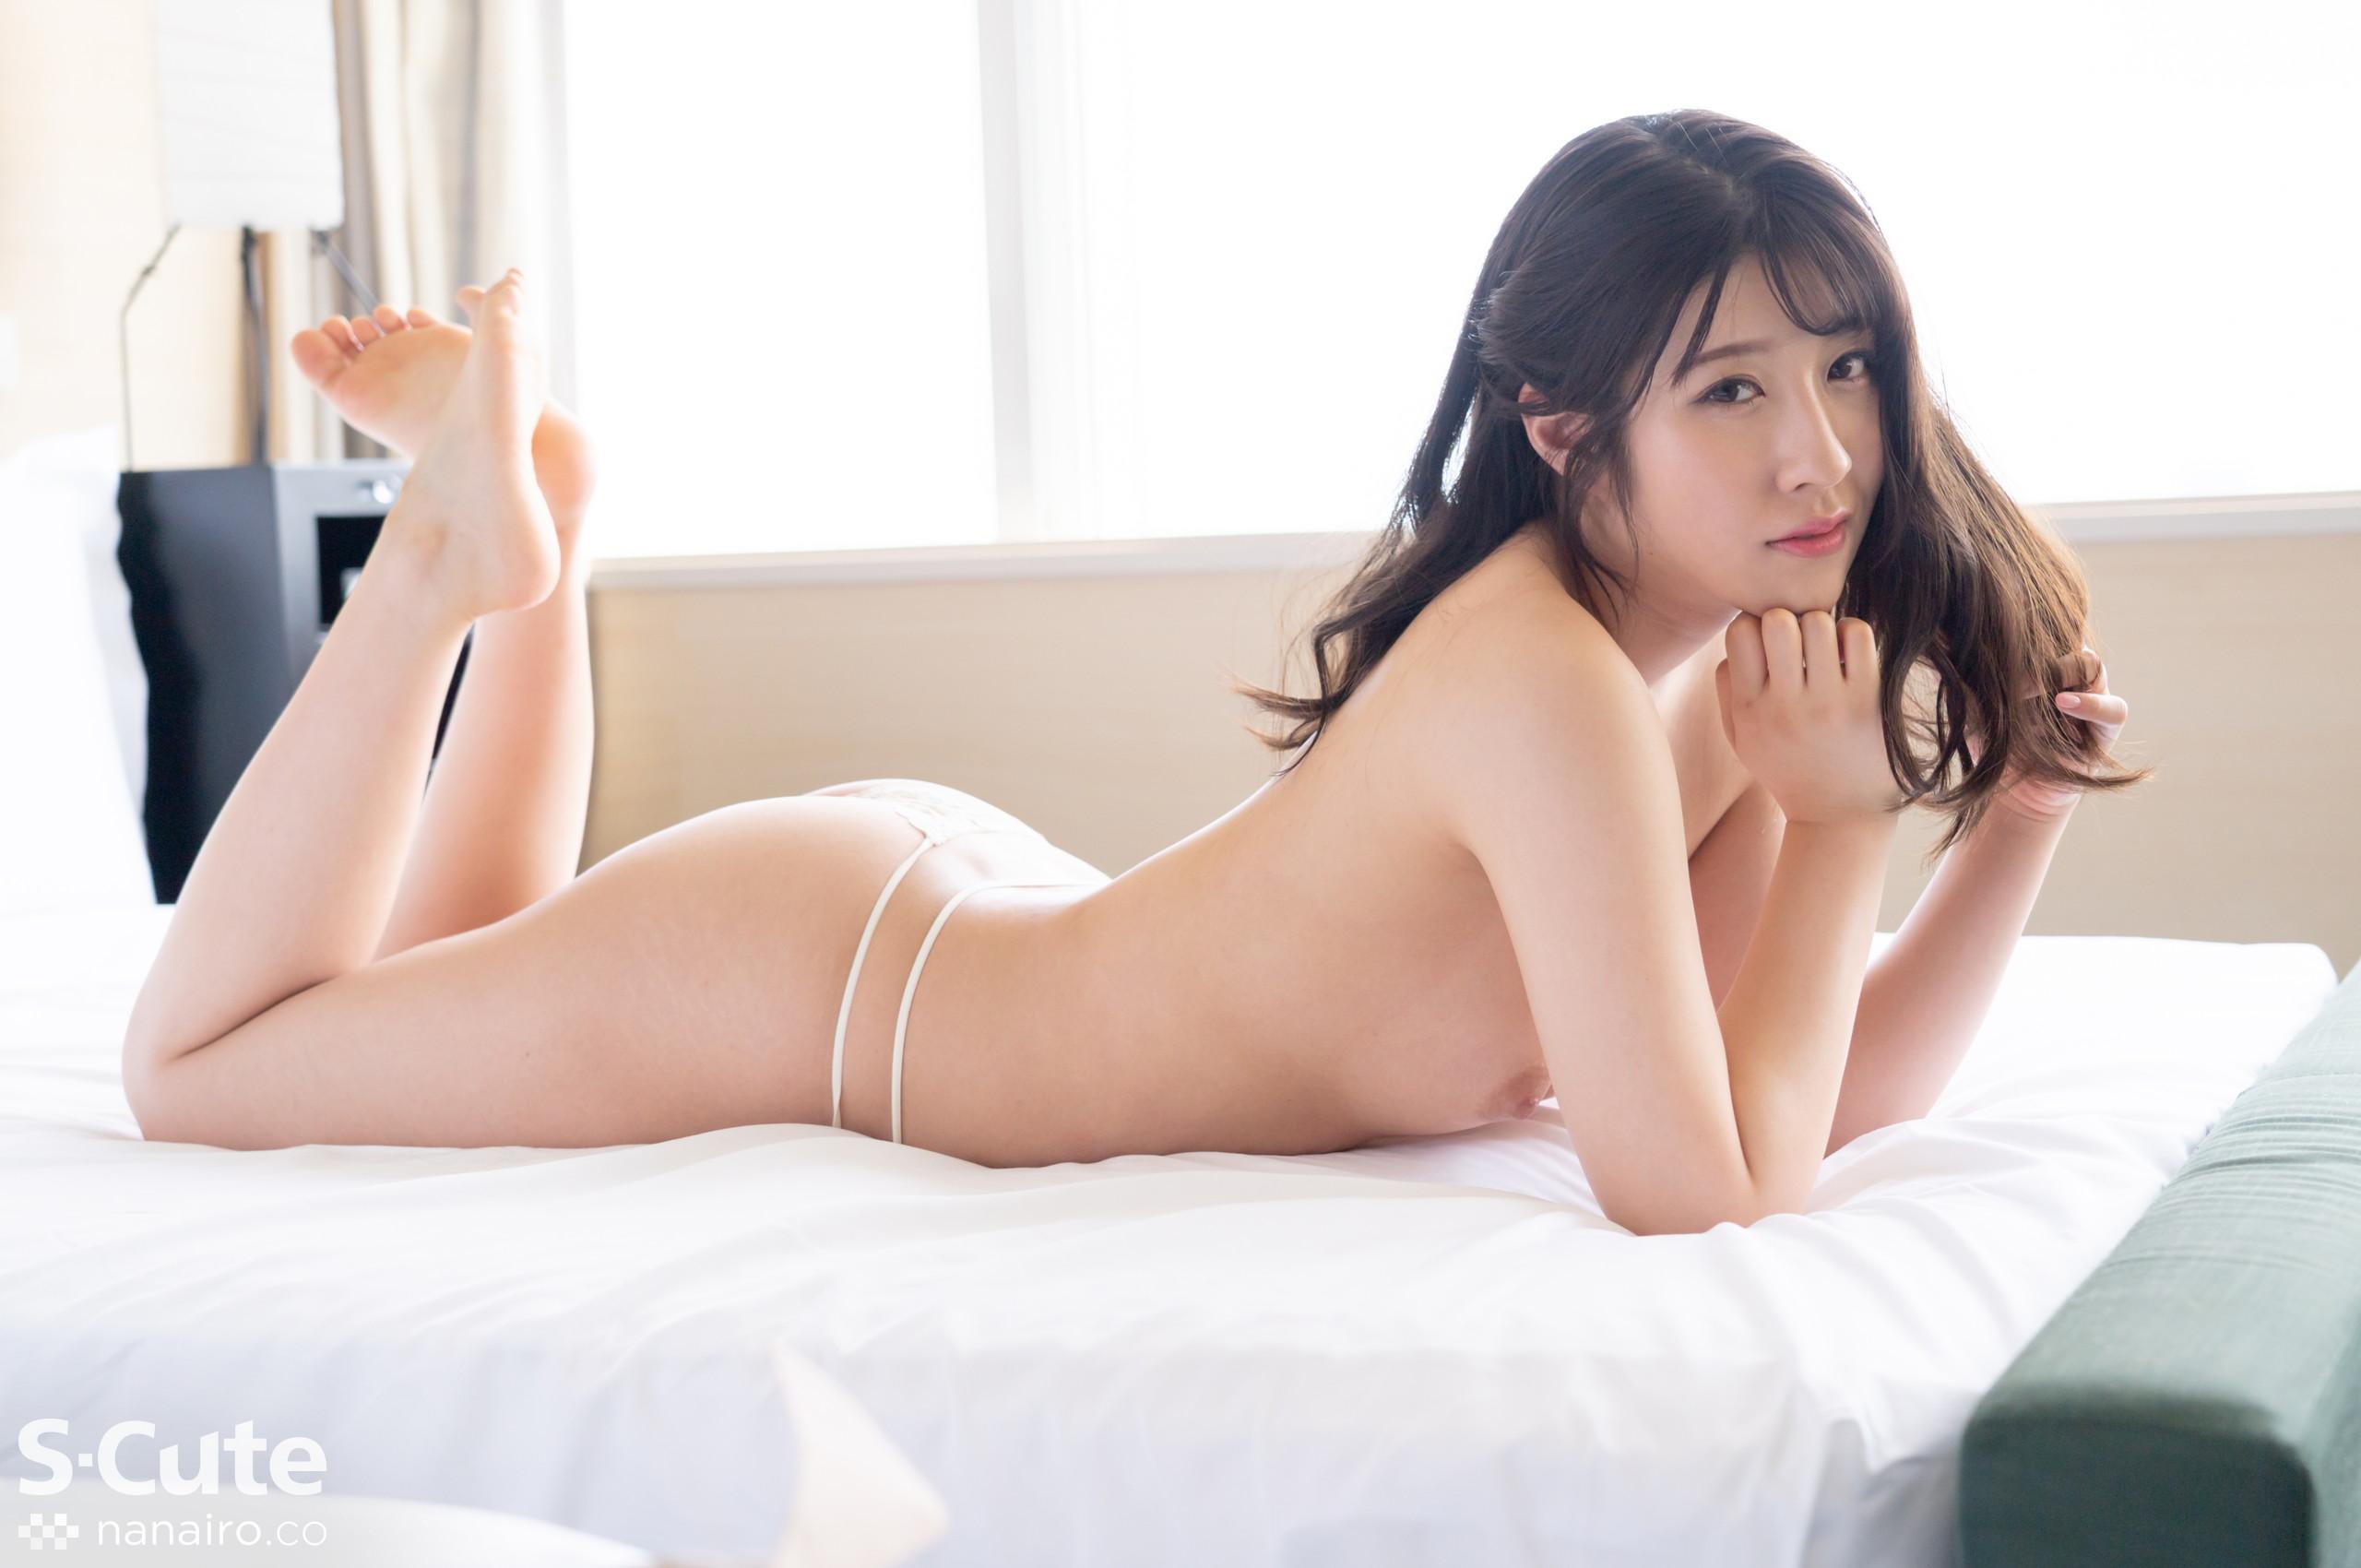 S-Cute 857_sakura_01 巨乳をほぐすイチャイチャ恋人SEX/Sakura